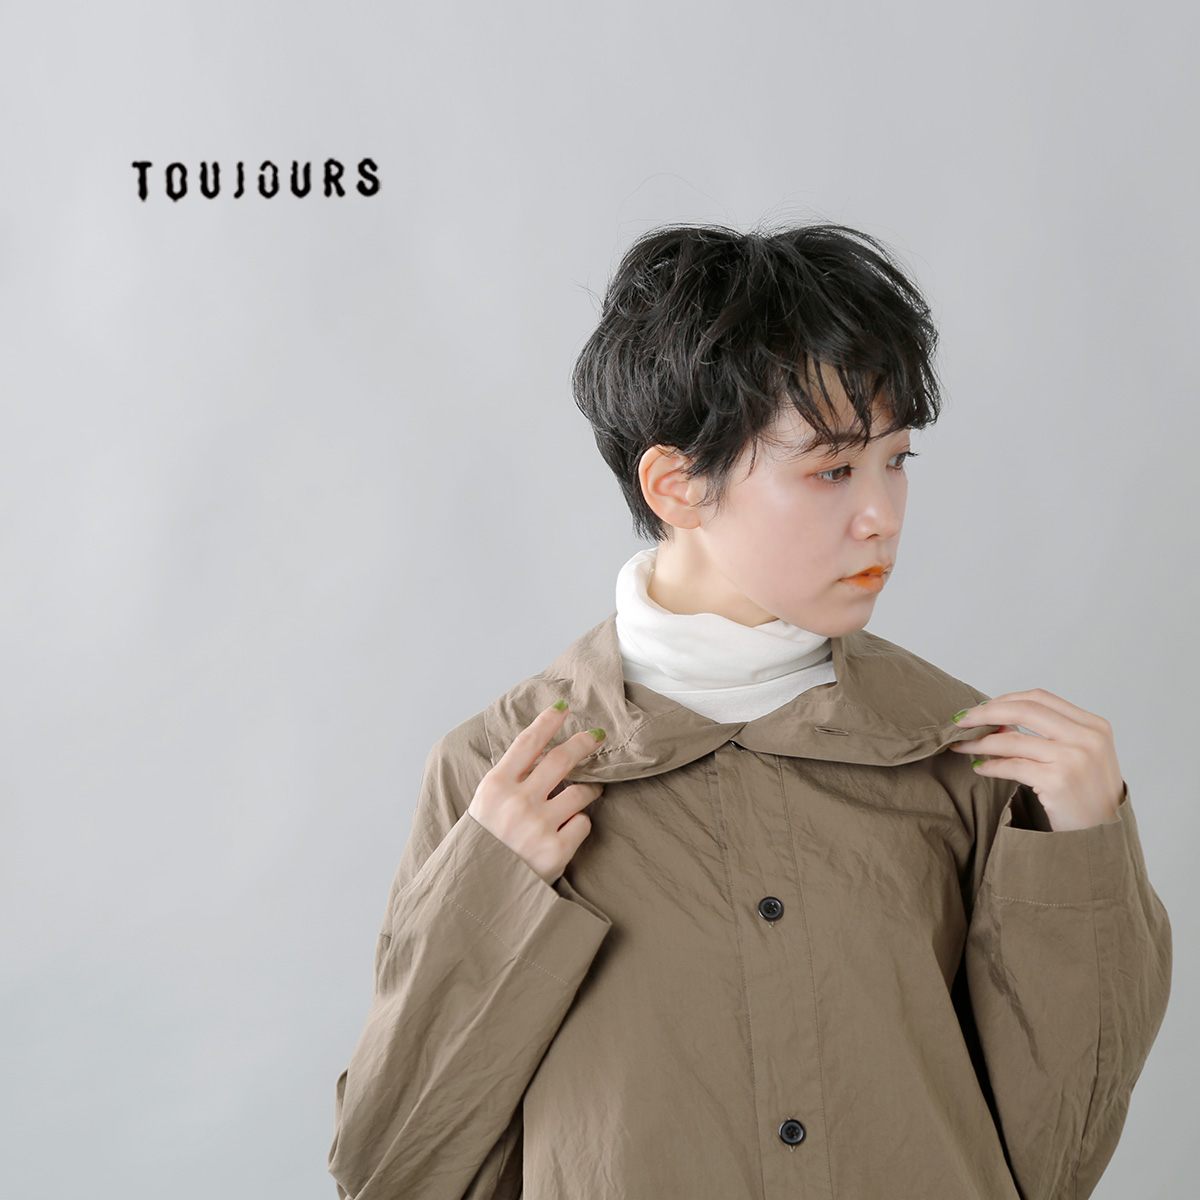 TOUJOURS(トゥジュー)シルクコットンハイネックシャツ mm33cs01